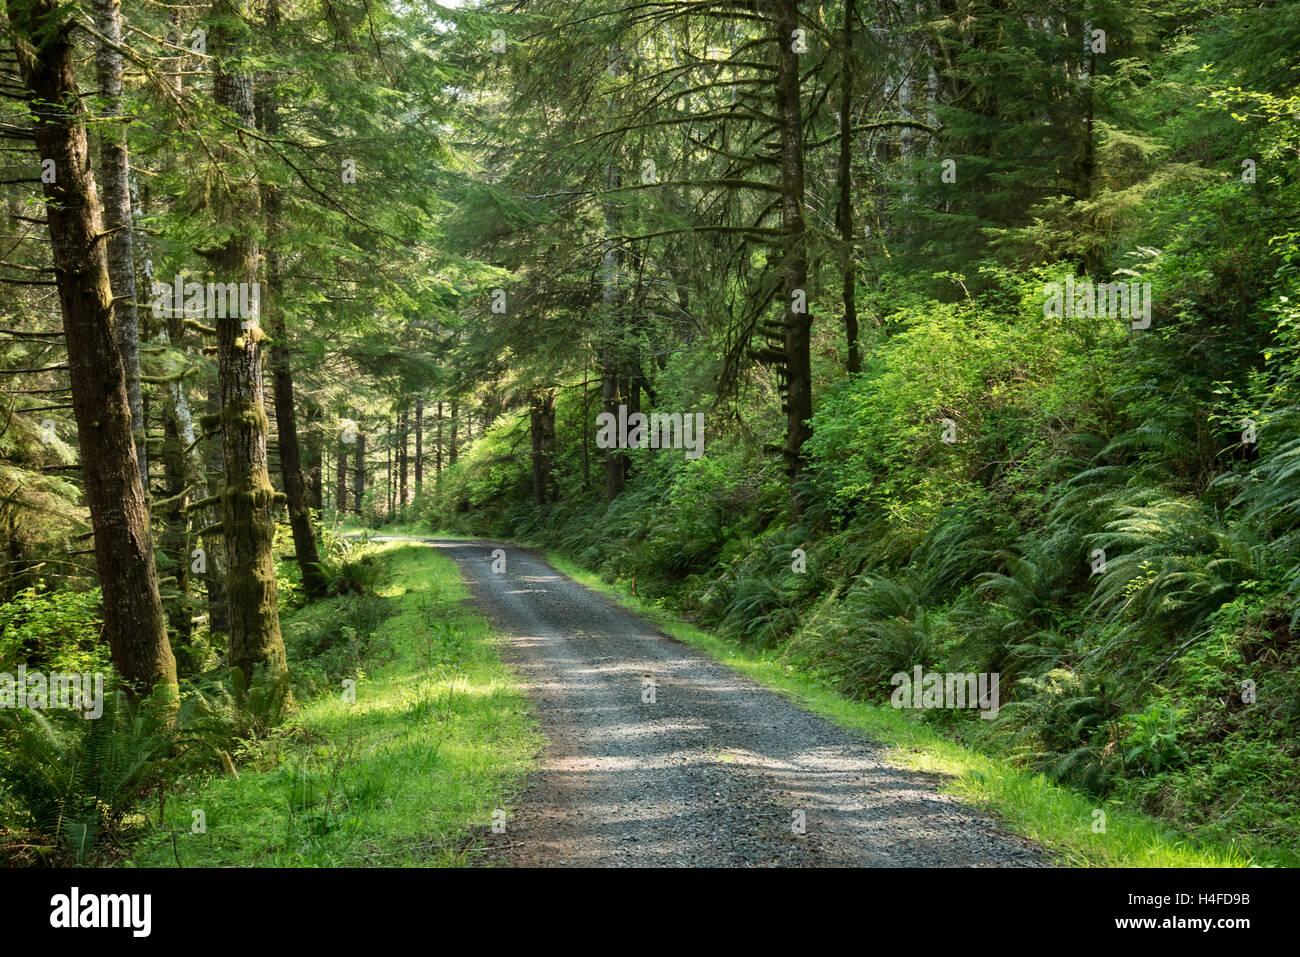 Forest Road 7500, Elliott State Forest, Coast Range Mountains, Oregon. - Stock Image